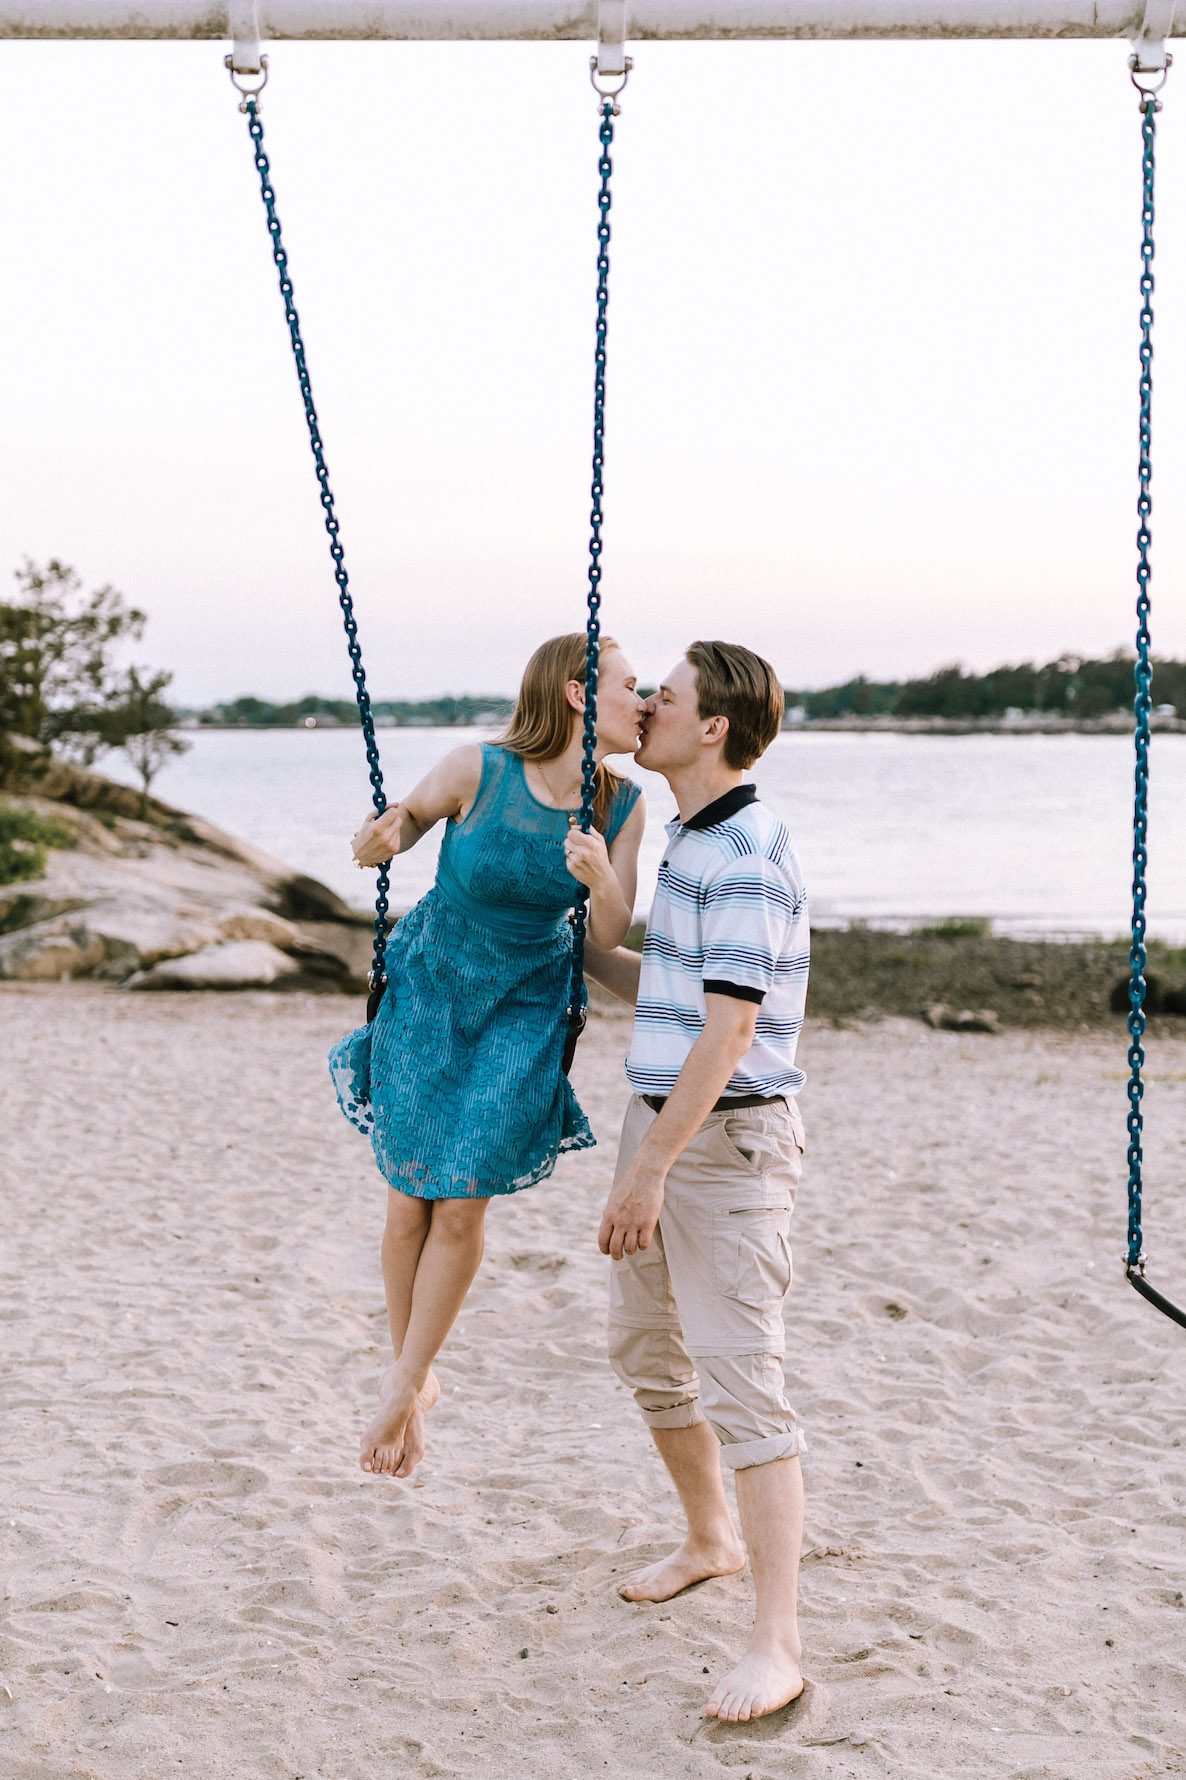 Siobhan-Michael-Engagement-181.jpg